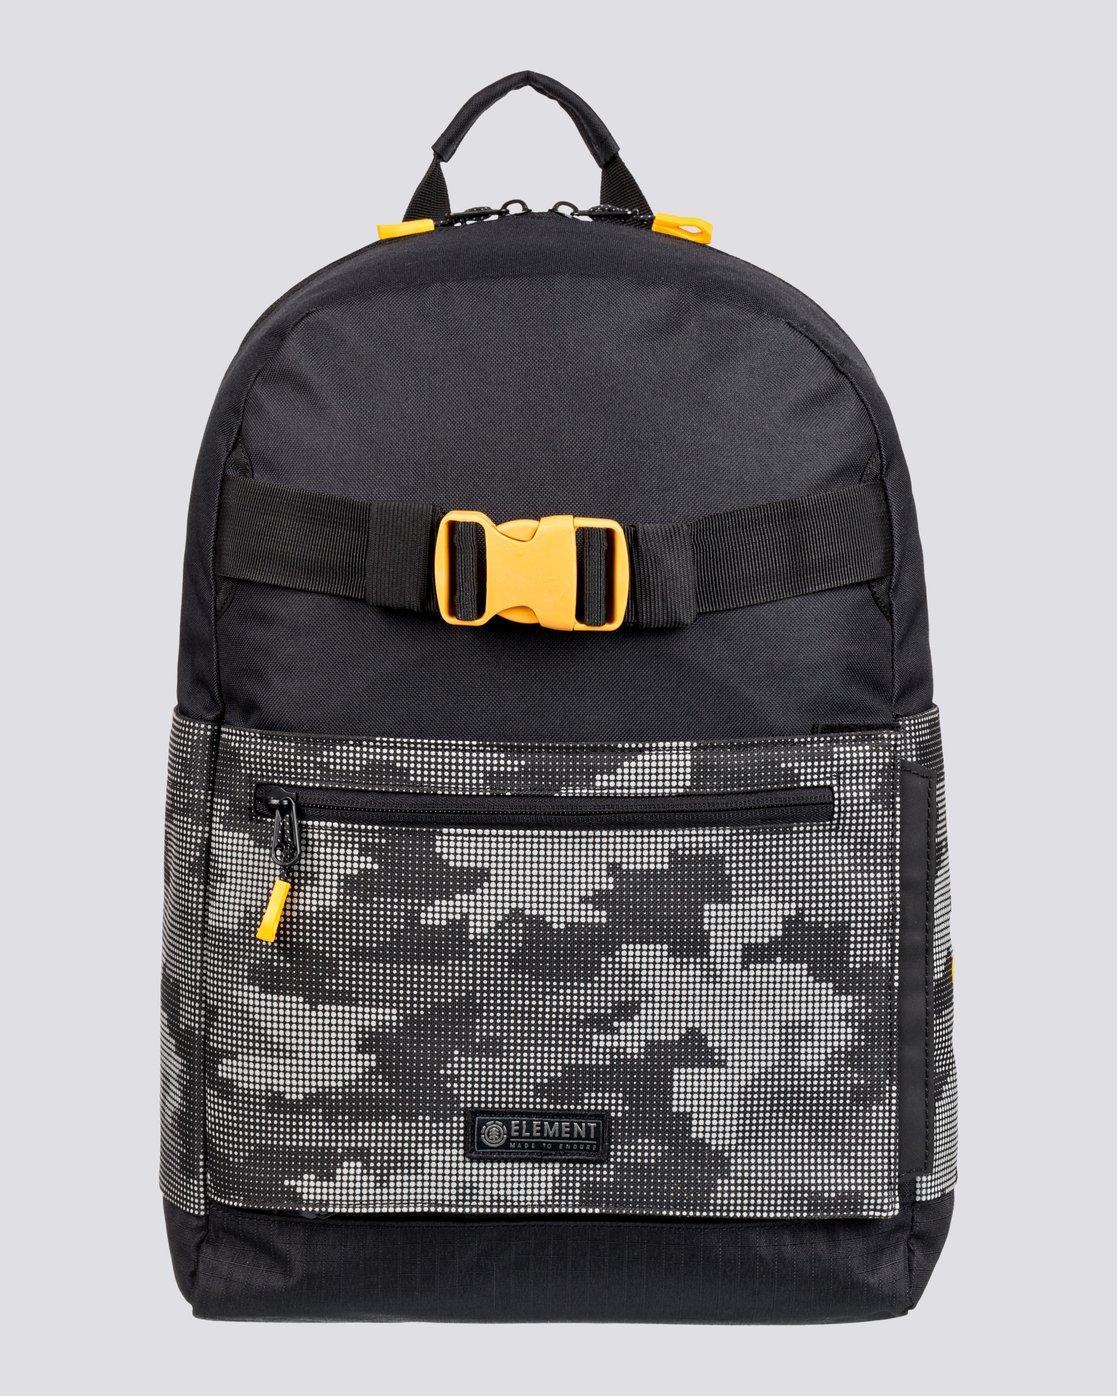 0 Resist Vast Skate - Backpack for Men  U5BPA4ELF0 Element